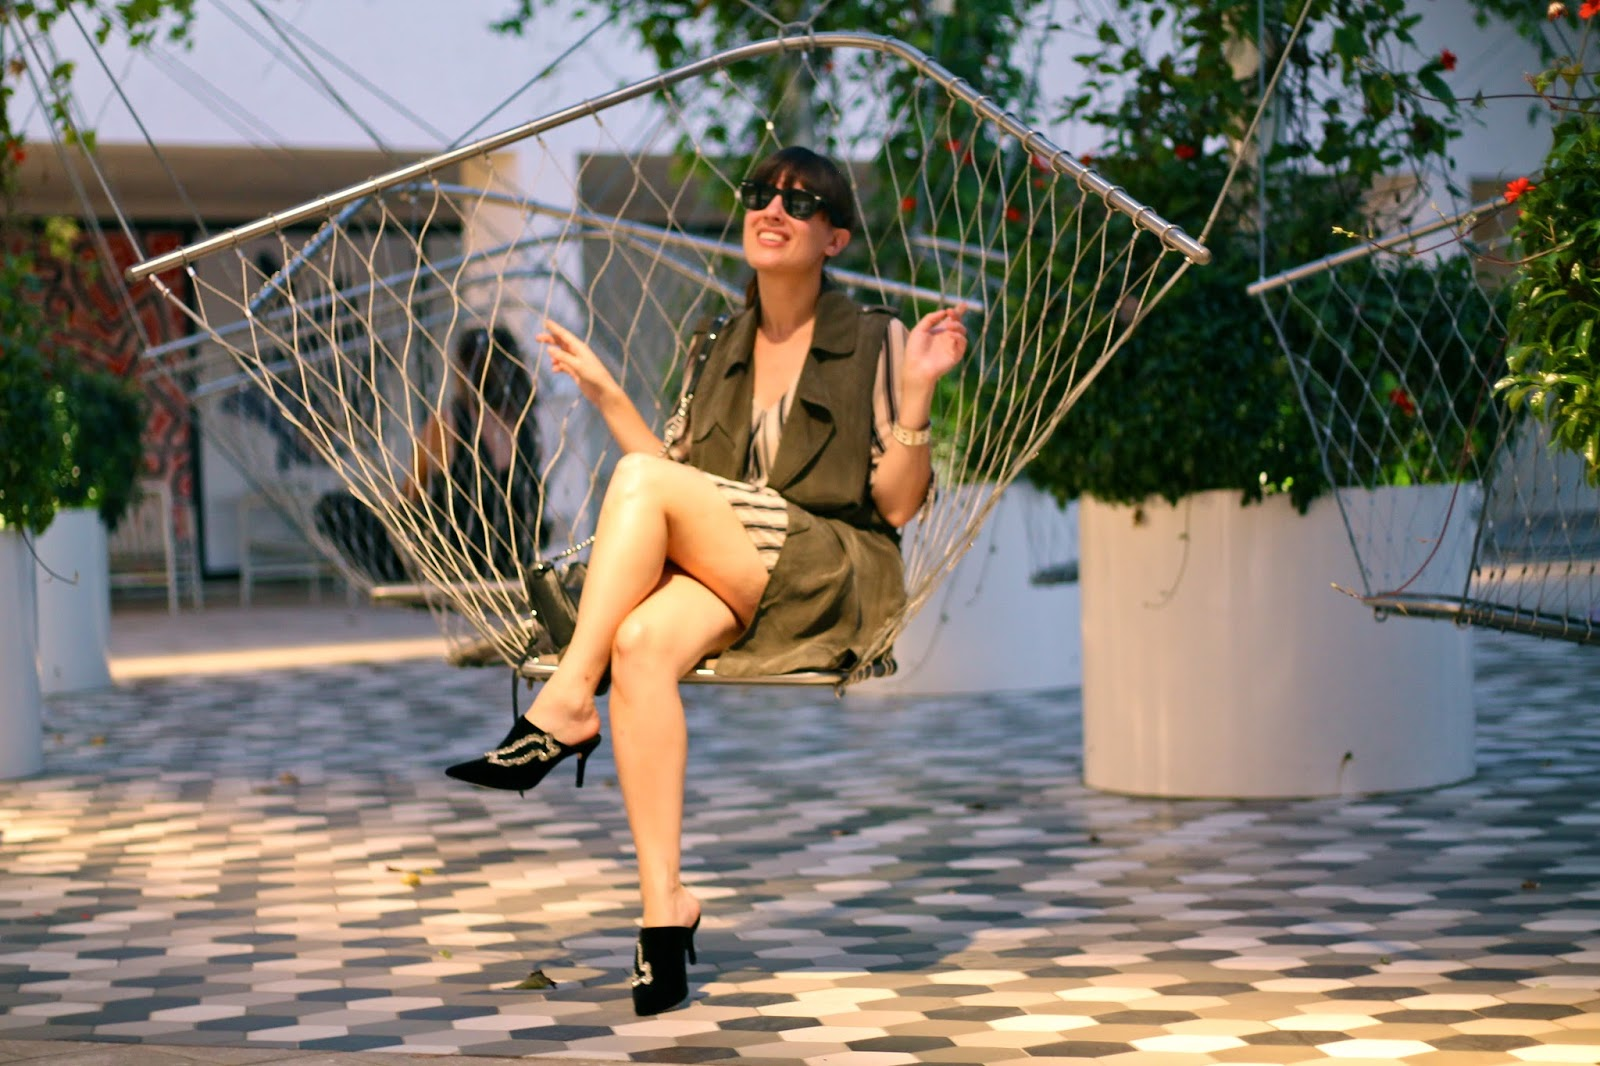 fashion blogger, fashion blog, style blog, style blogger, Miami fashion blogger, capsule wardrobe, spring capsule, minimalist blogger, minimalism, minimalist wardrobe, spring capsule wardrobe